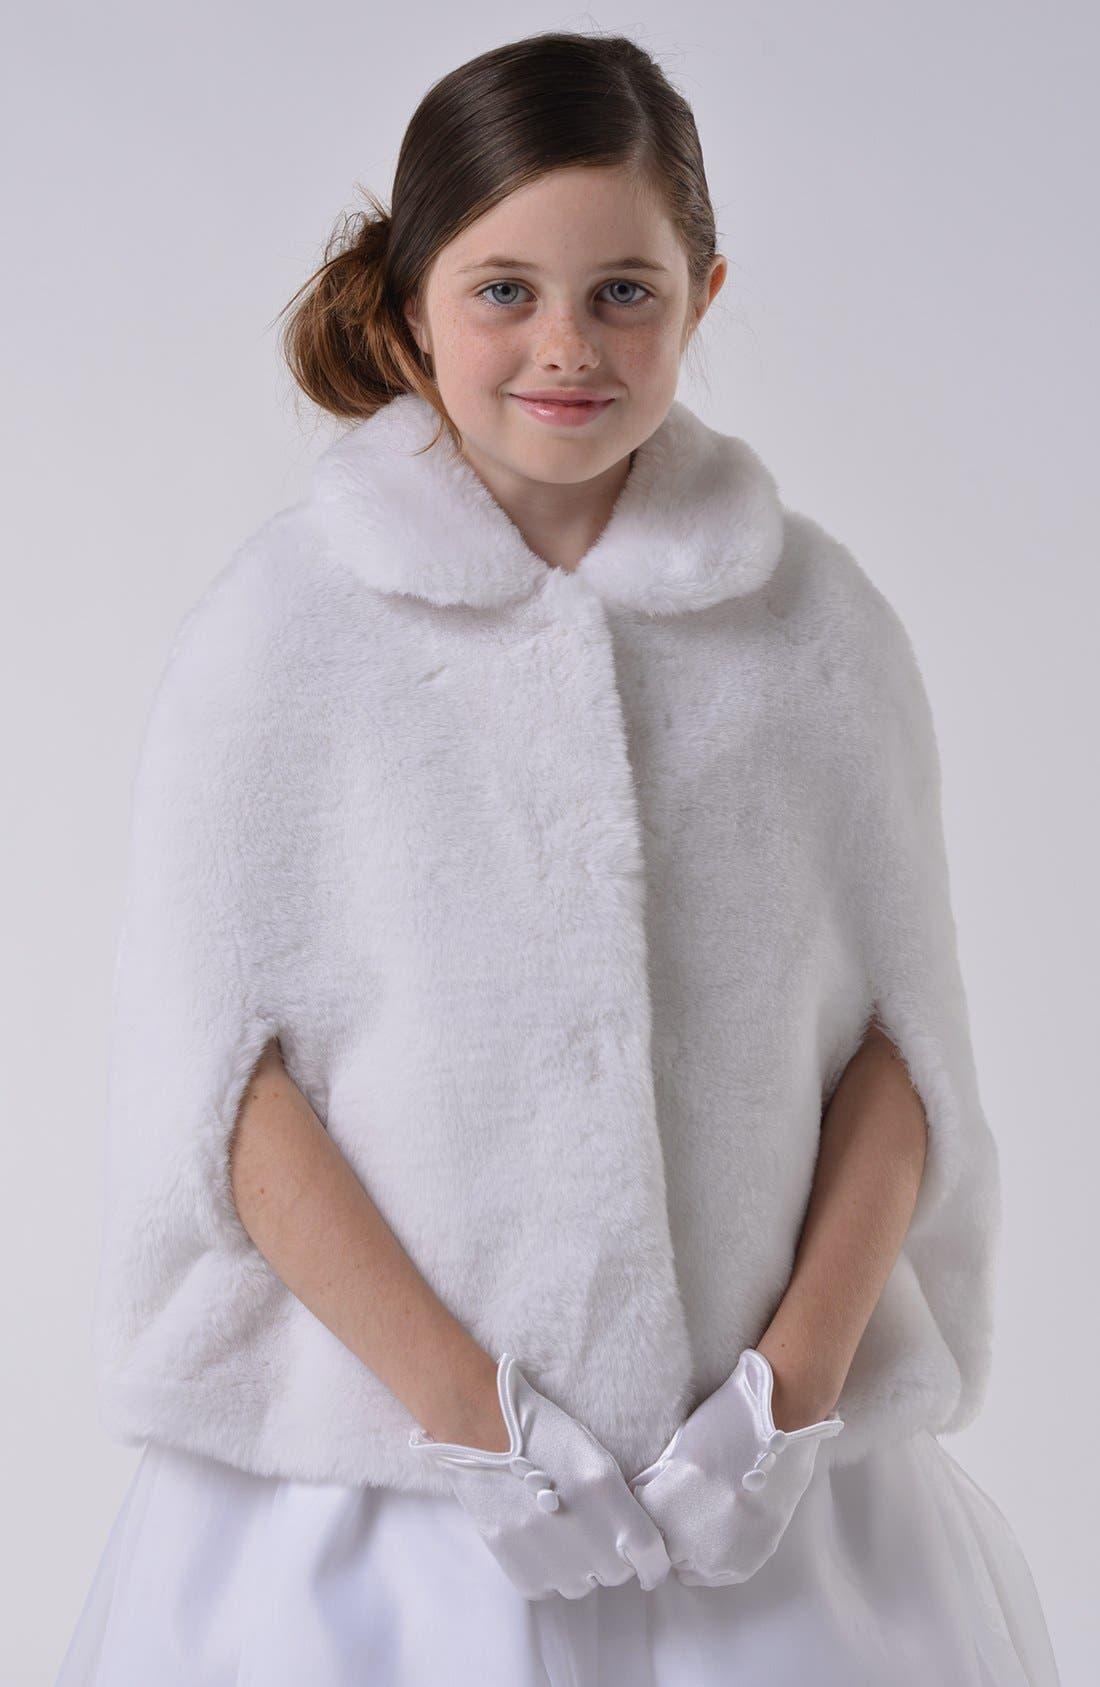 Alternate Image 1 Selected - Us Angels Communion Faux Fur Cape (Little Girls & Big Girls)